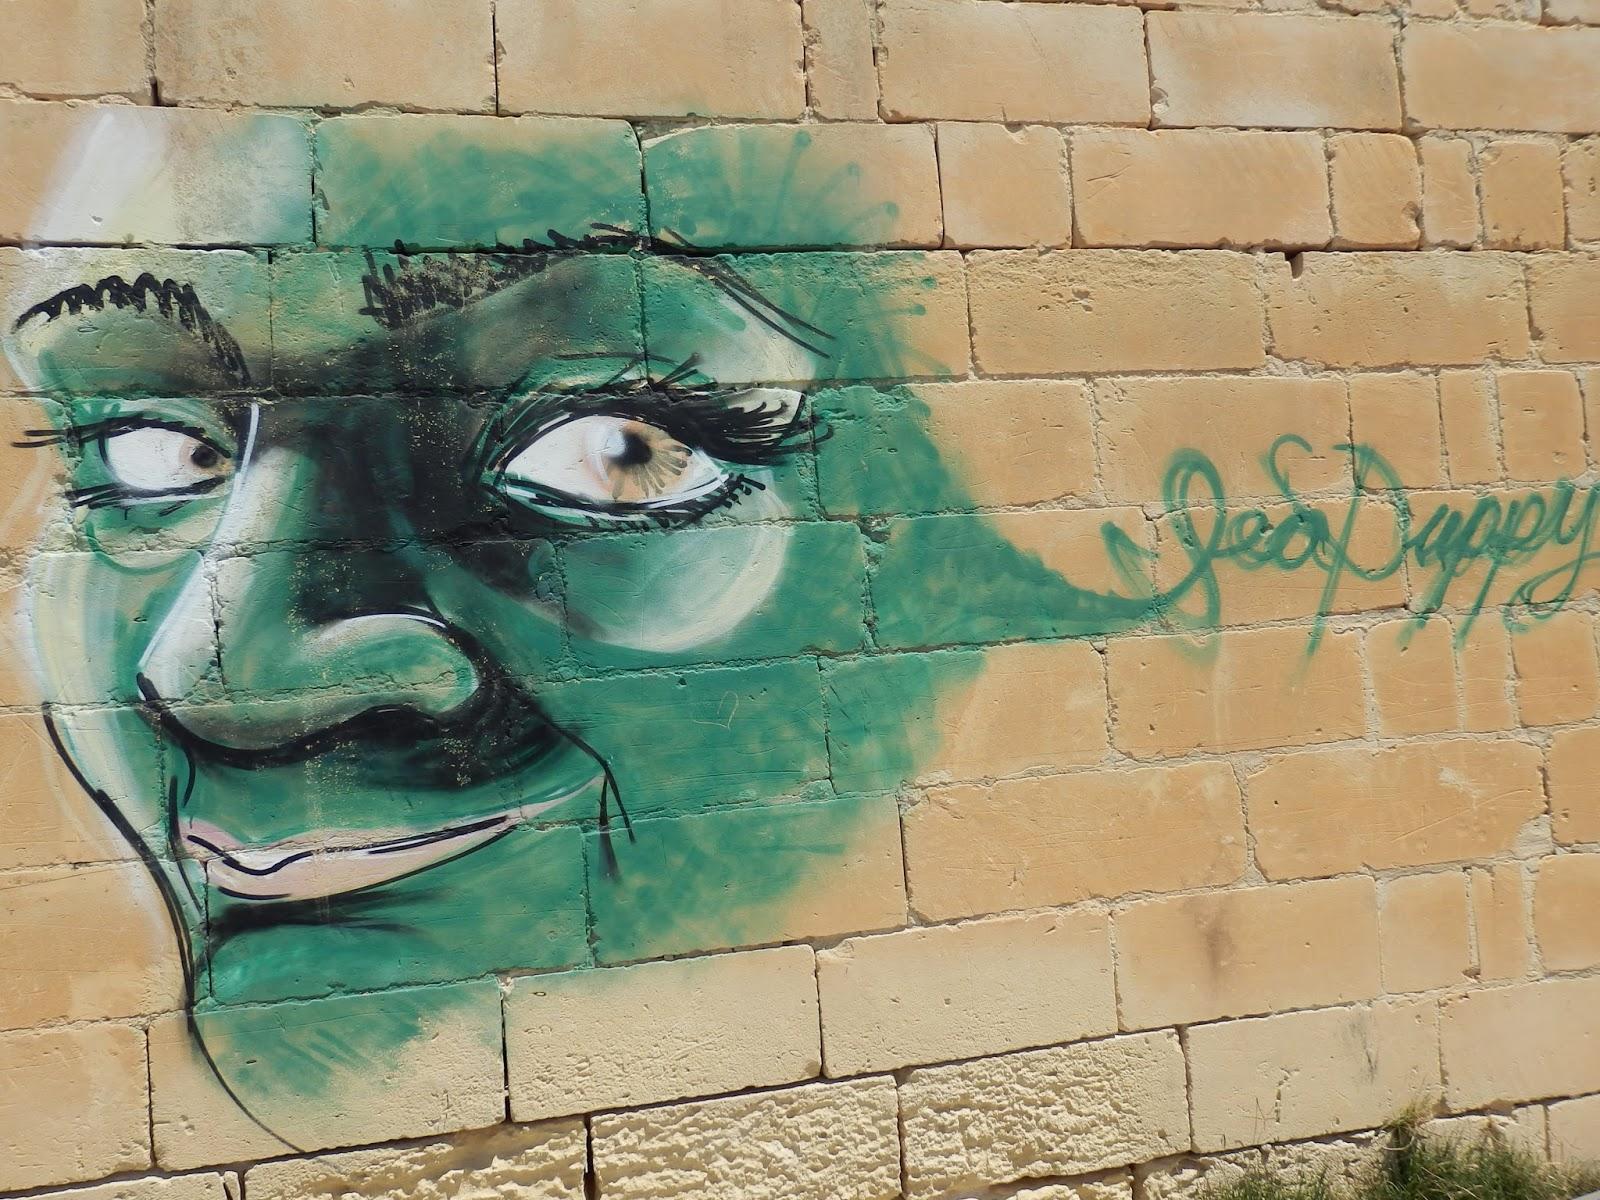 Maltese grafitti